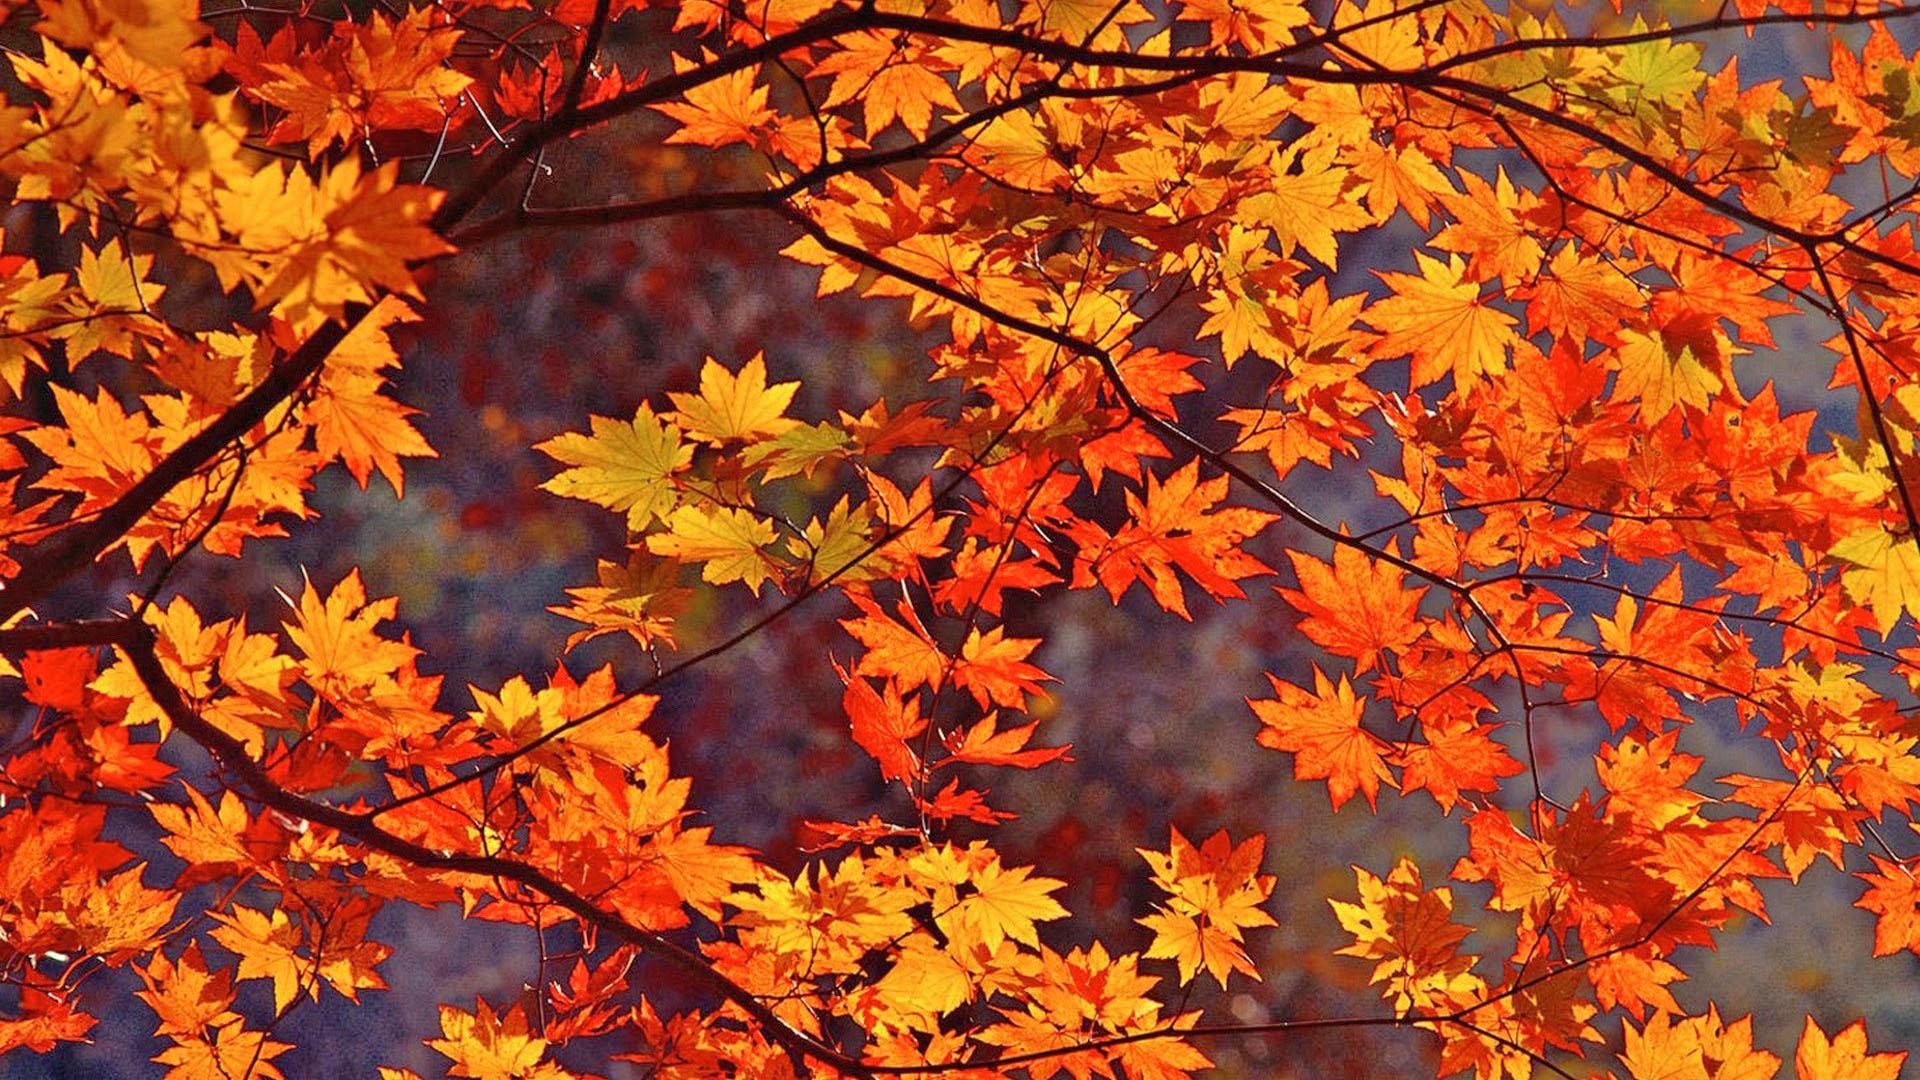 Fall Leaves HD Wallpaper 1920x1080